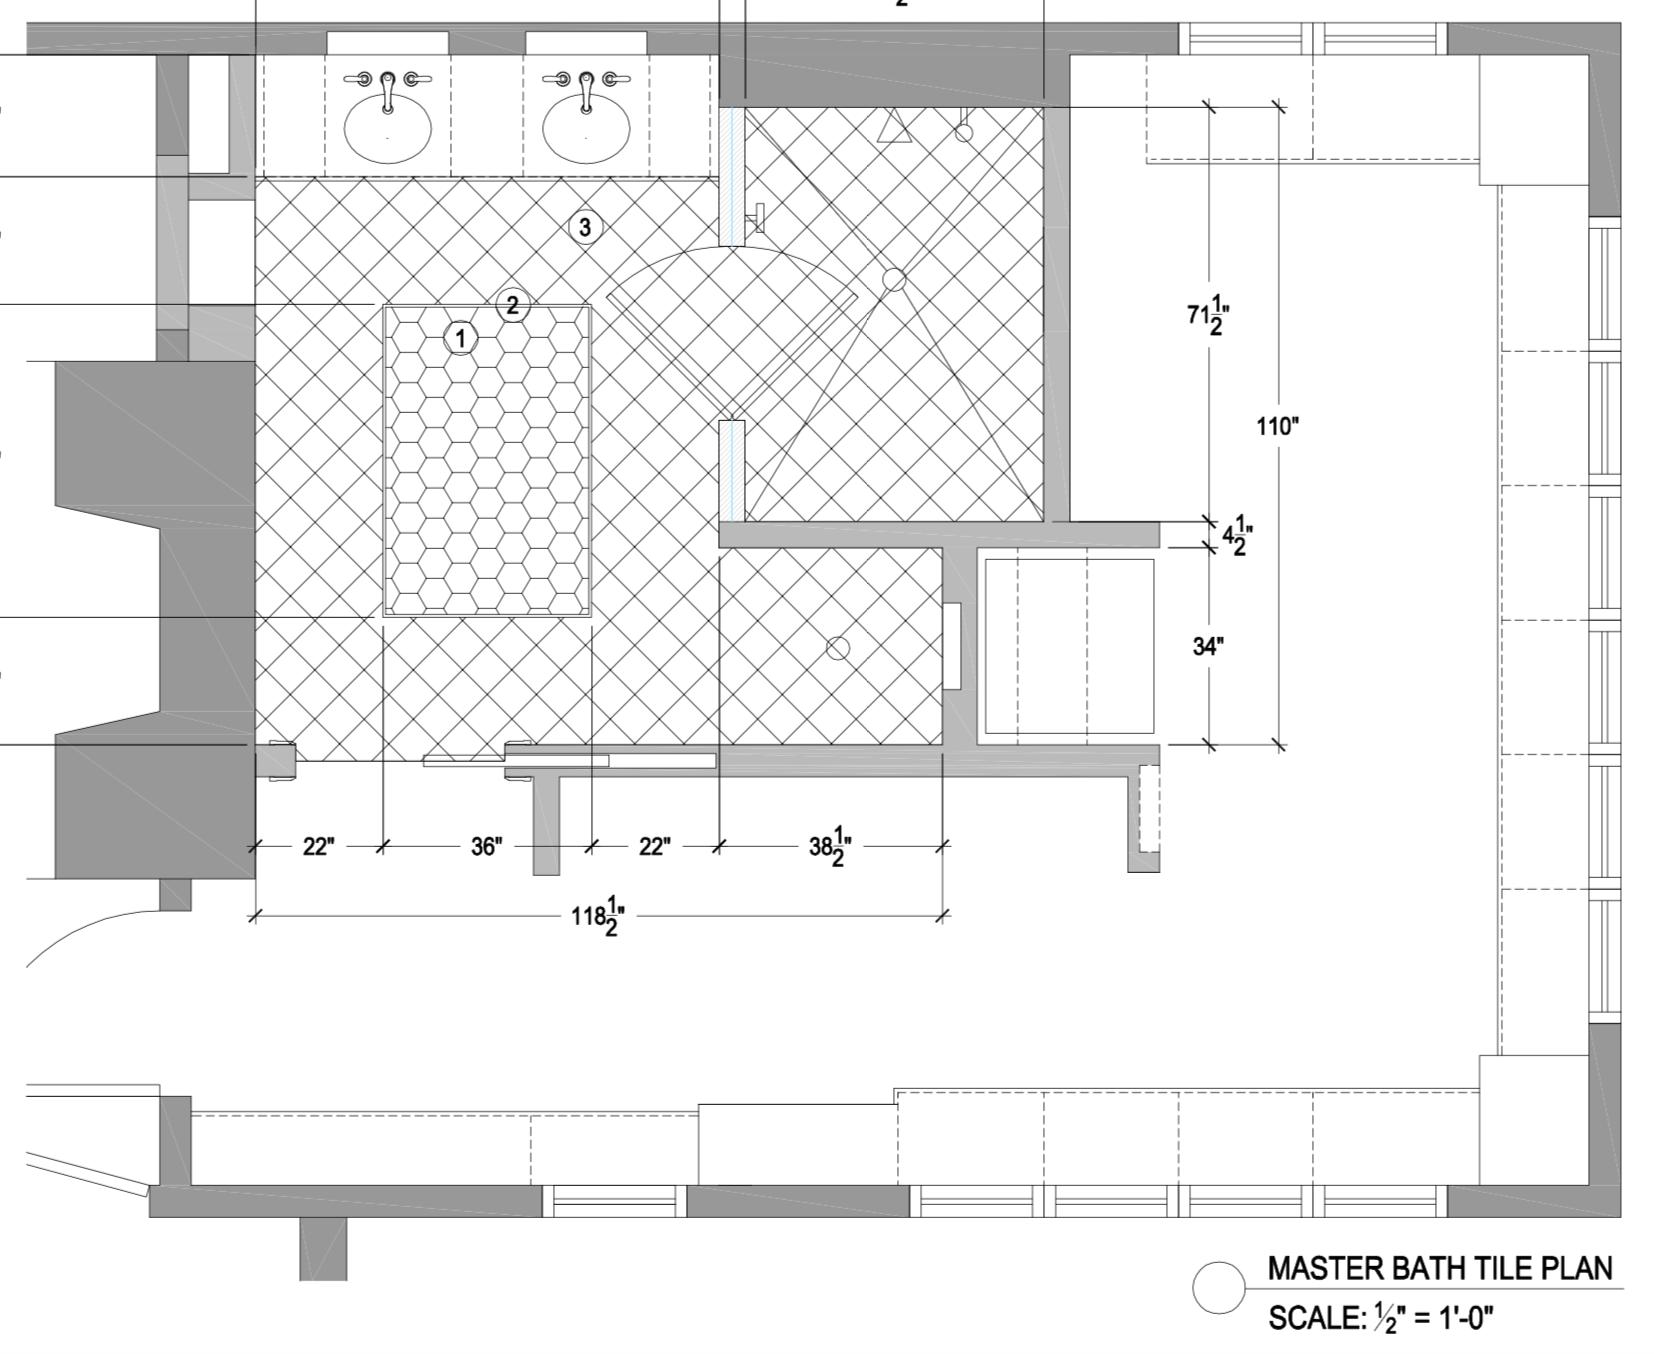 Fuchsia Design Renovation Heritage Hill Grand Rapids, MI